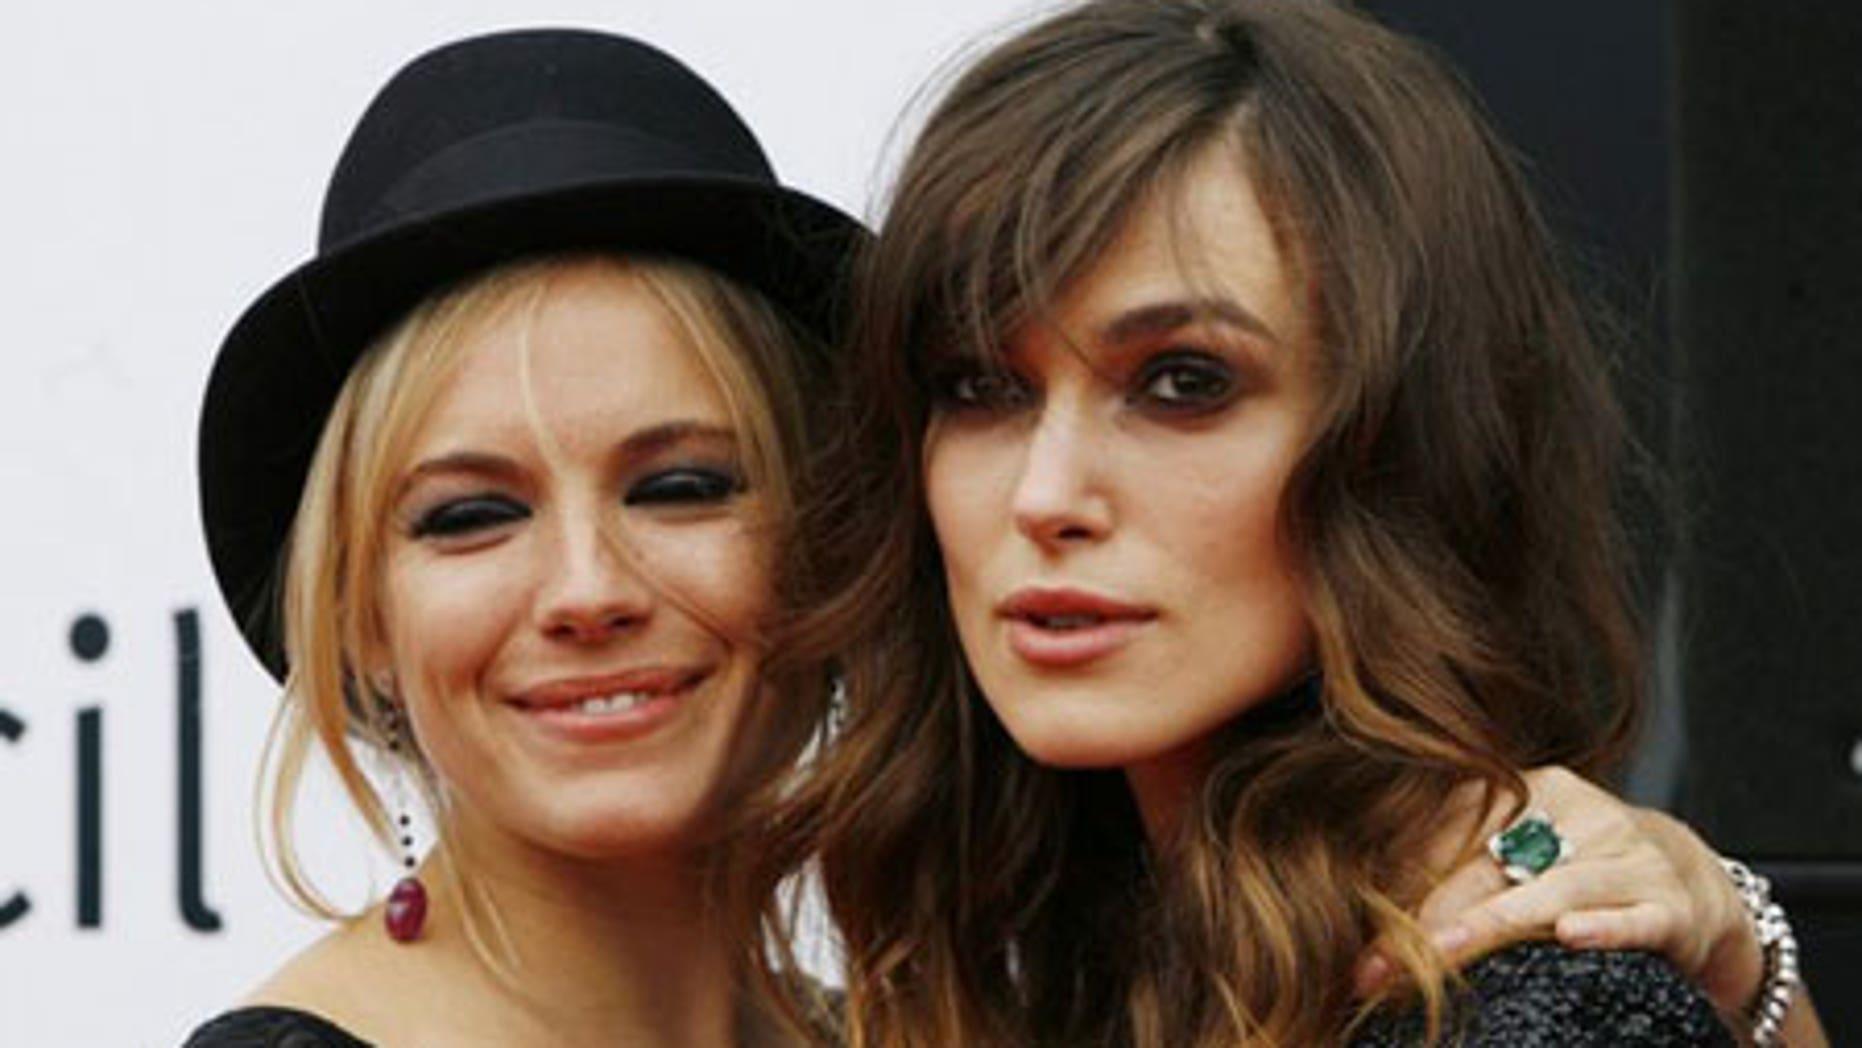 Sienna Miller and Keira Knightley share their bathtime secrets.